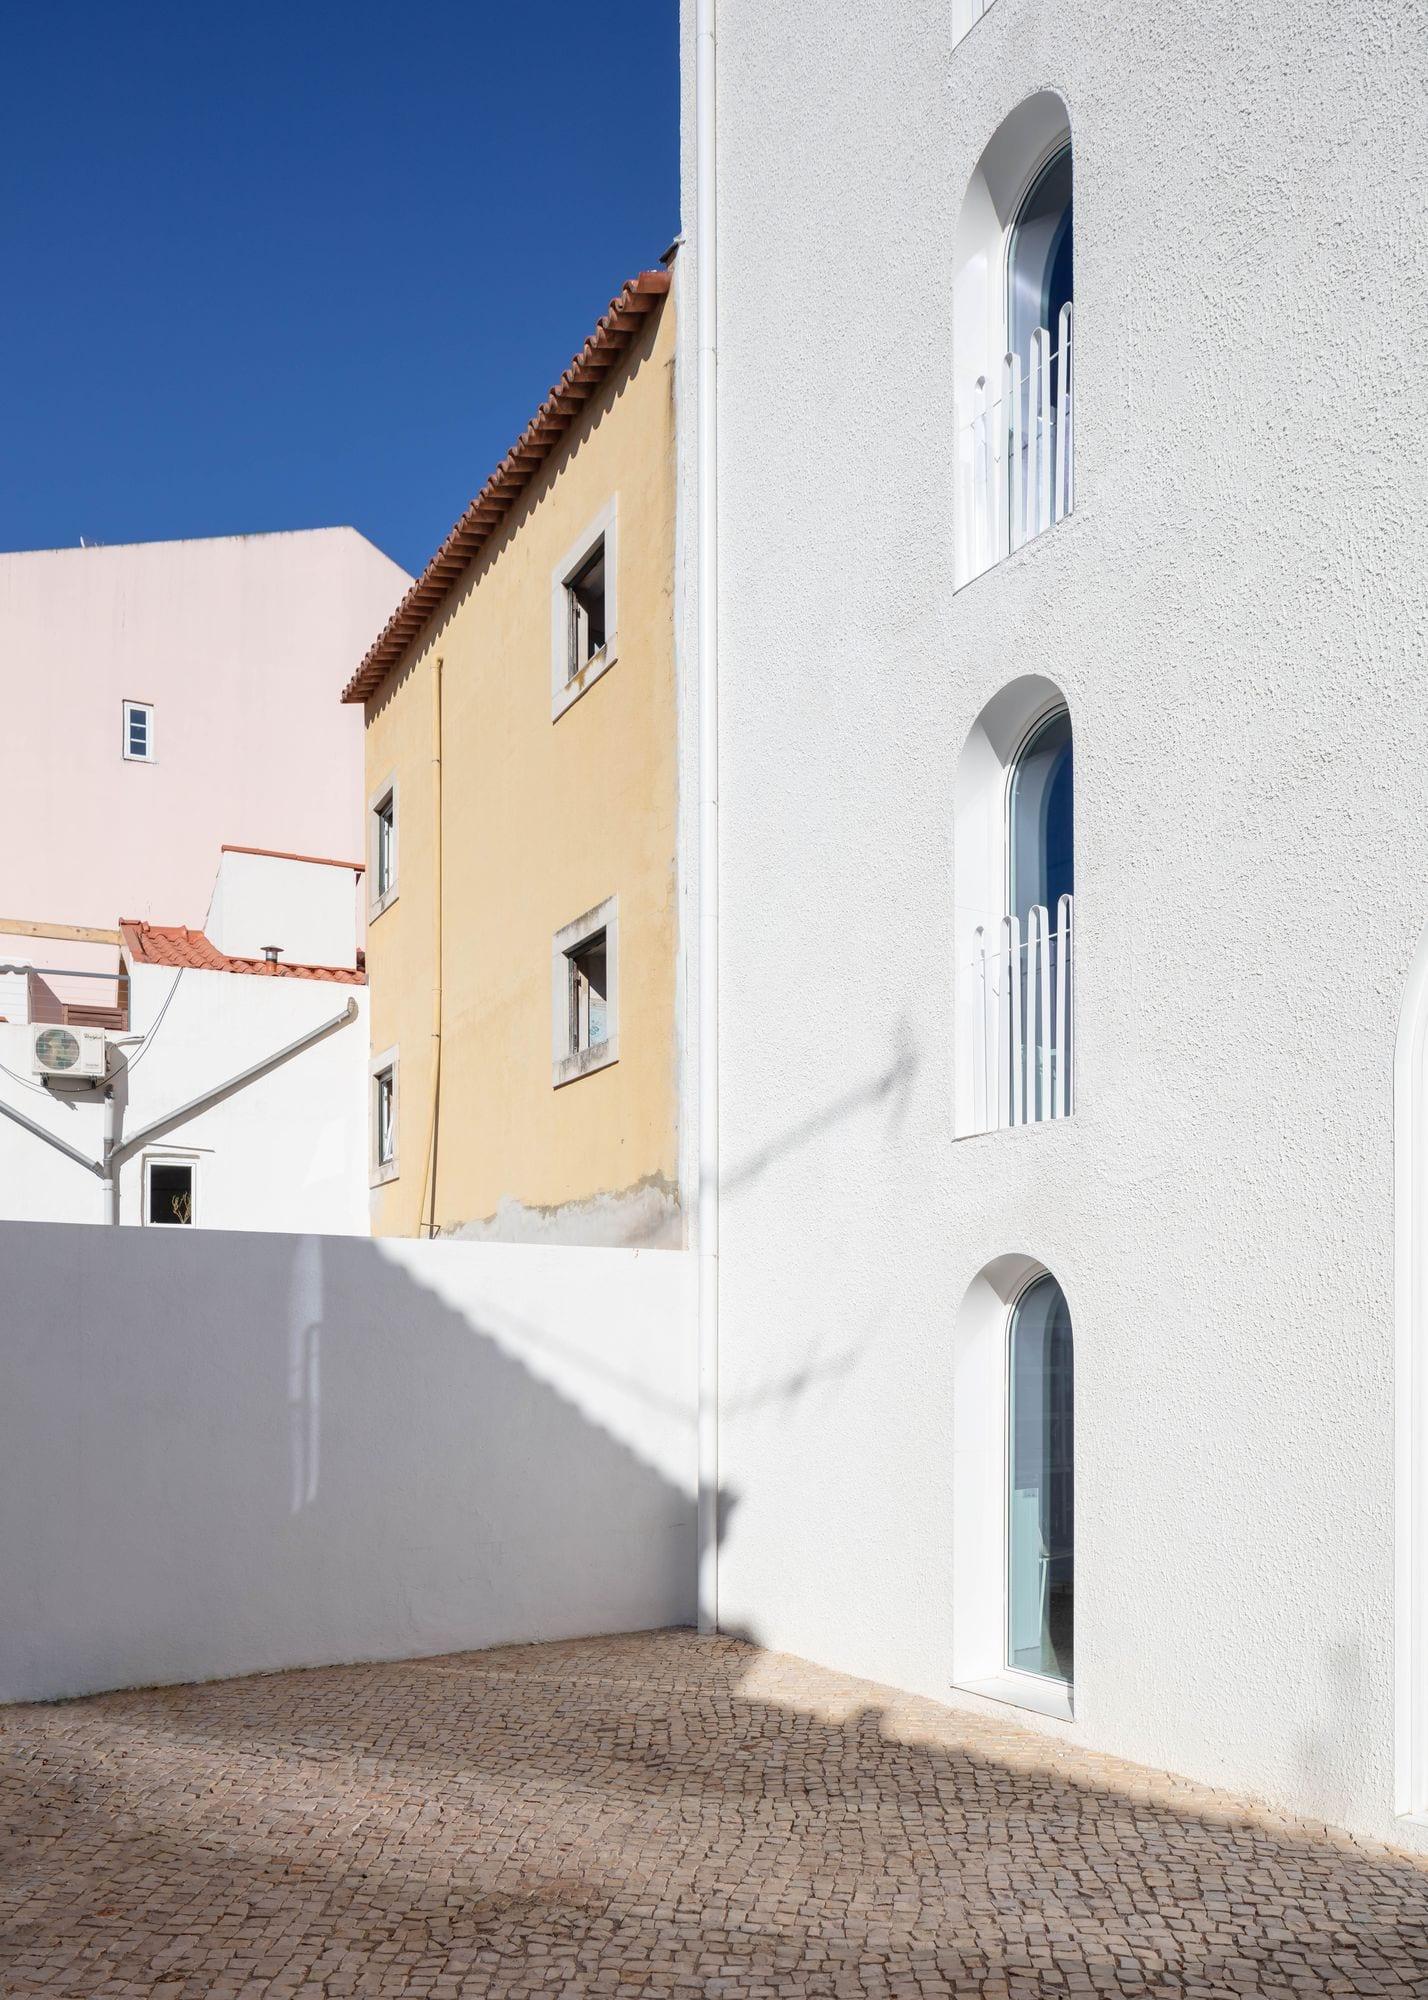 Dodged House In Lisbon By Leopold Banchini Daniel Zamarbide Yellowtrace 04